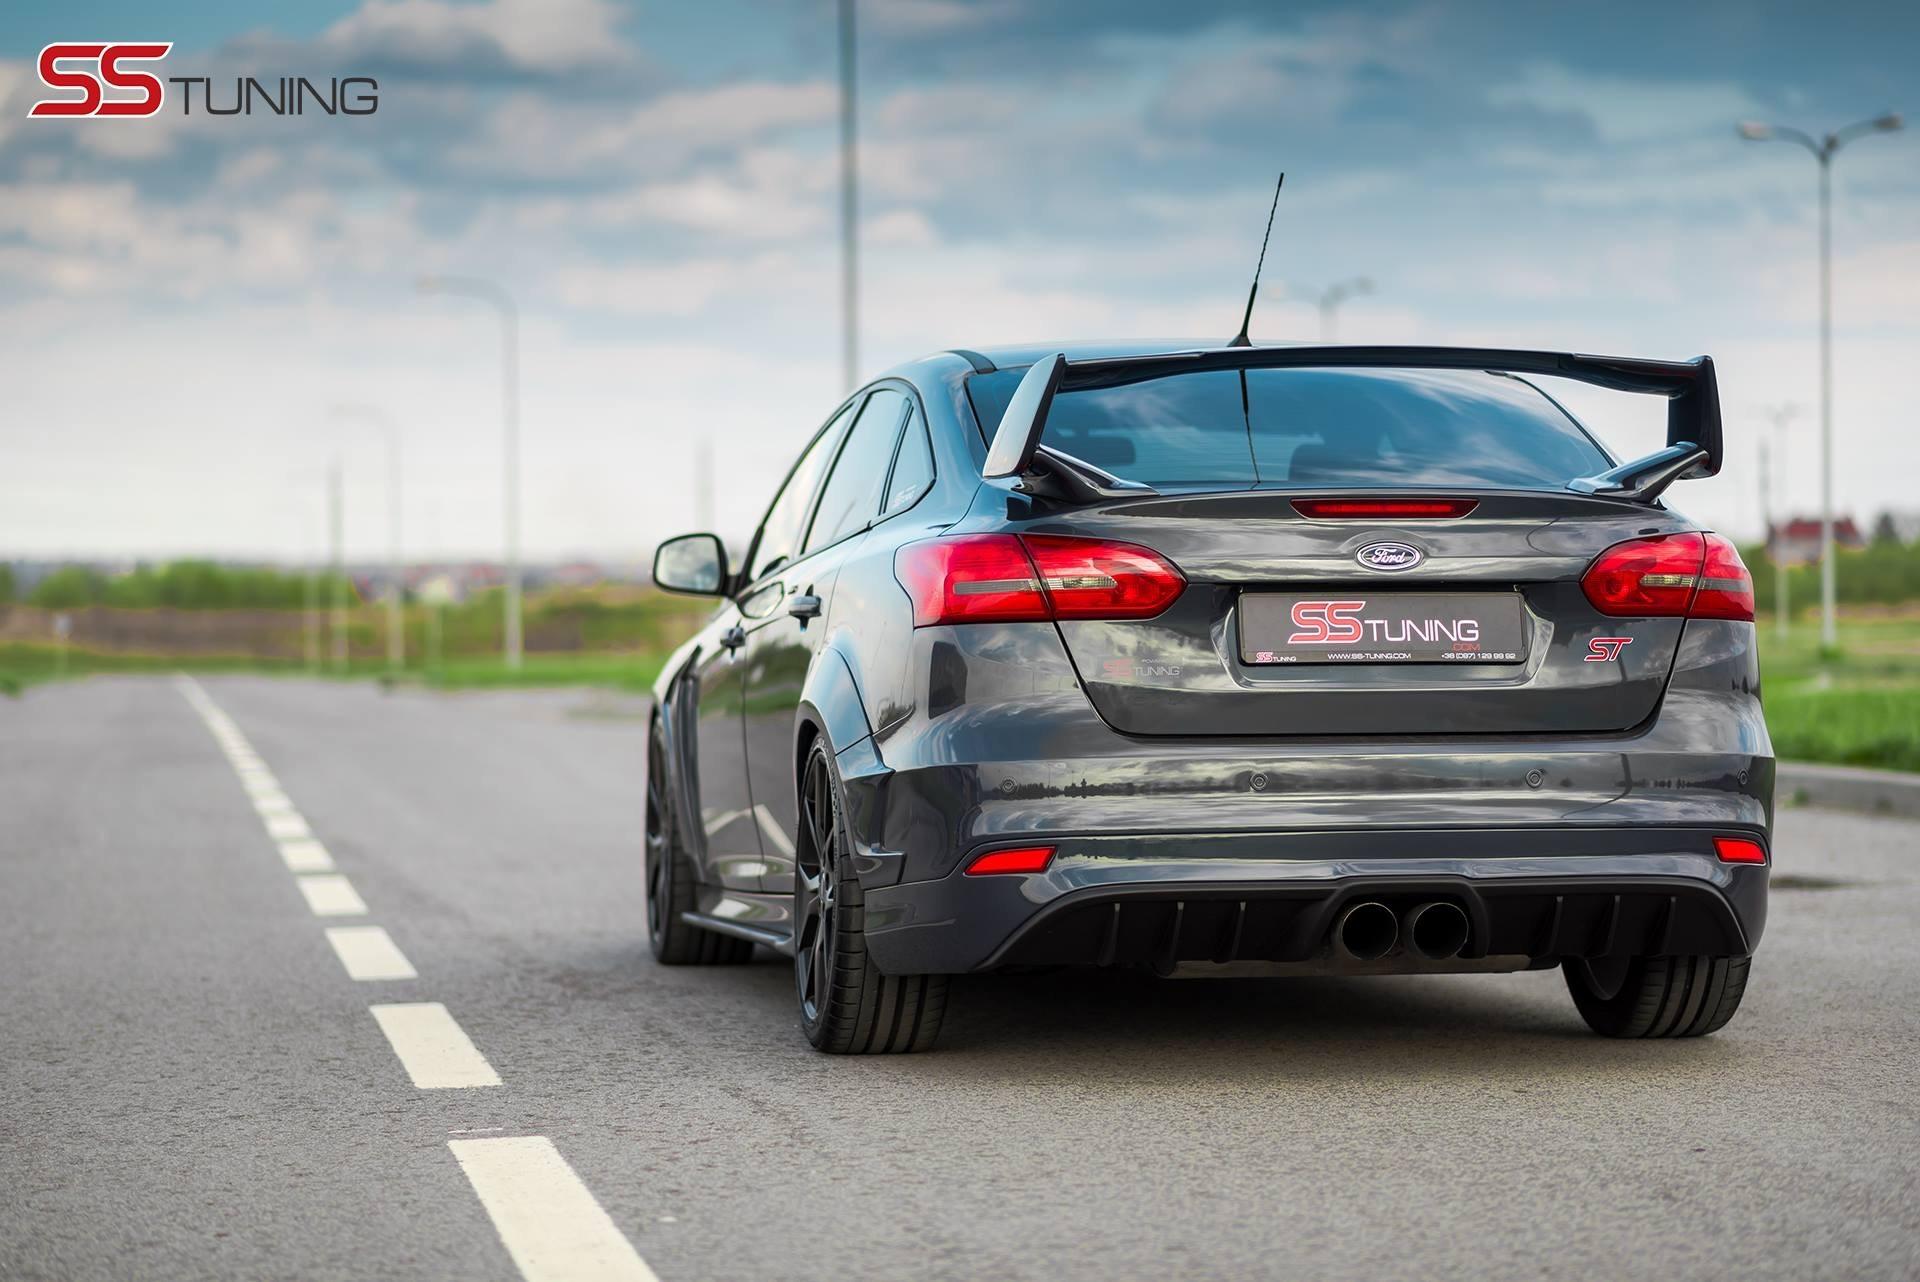 ford-focus-st-sedan-by-ss-tuning-has-an-sti-wing_12-autonovosti.me-6